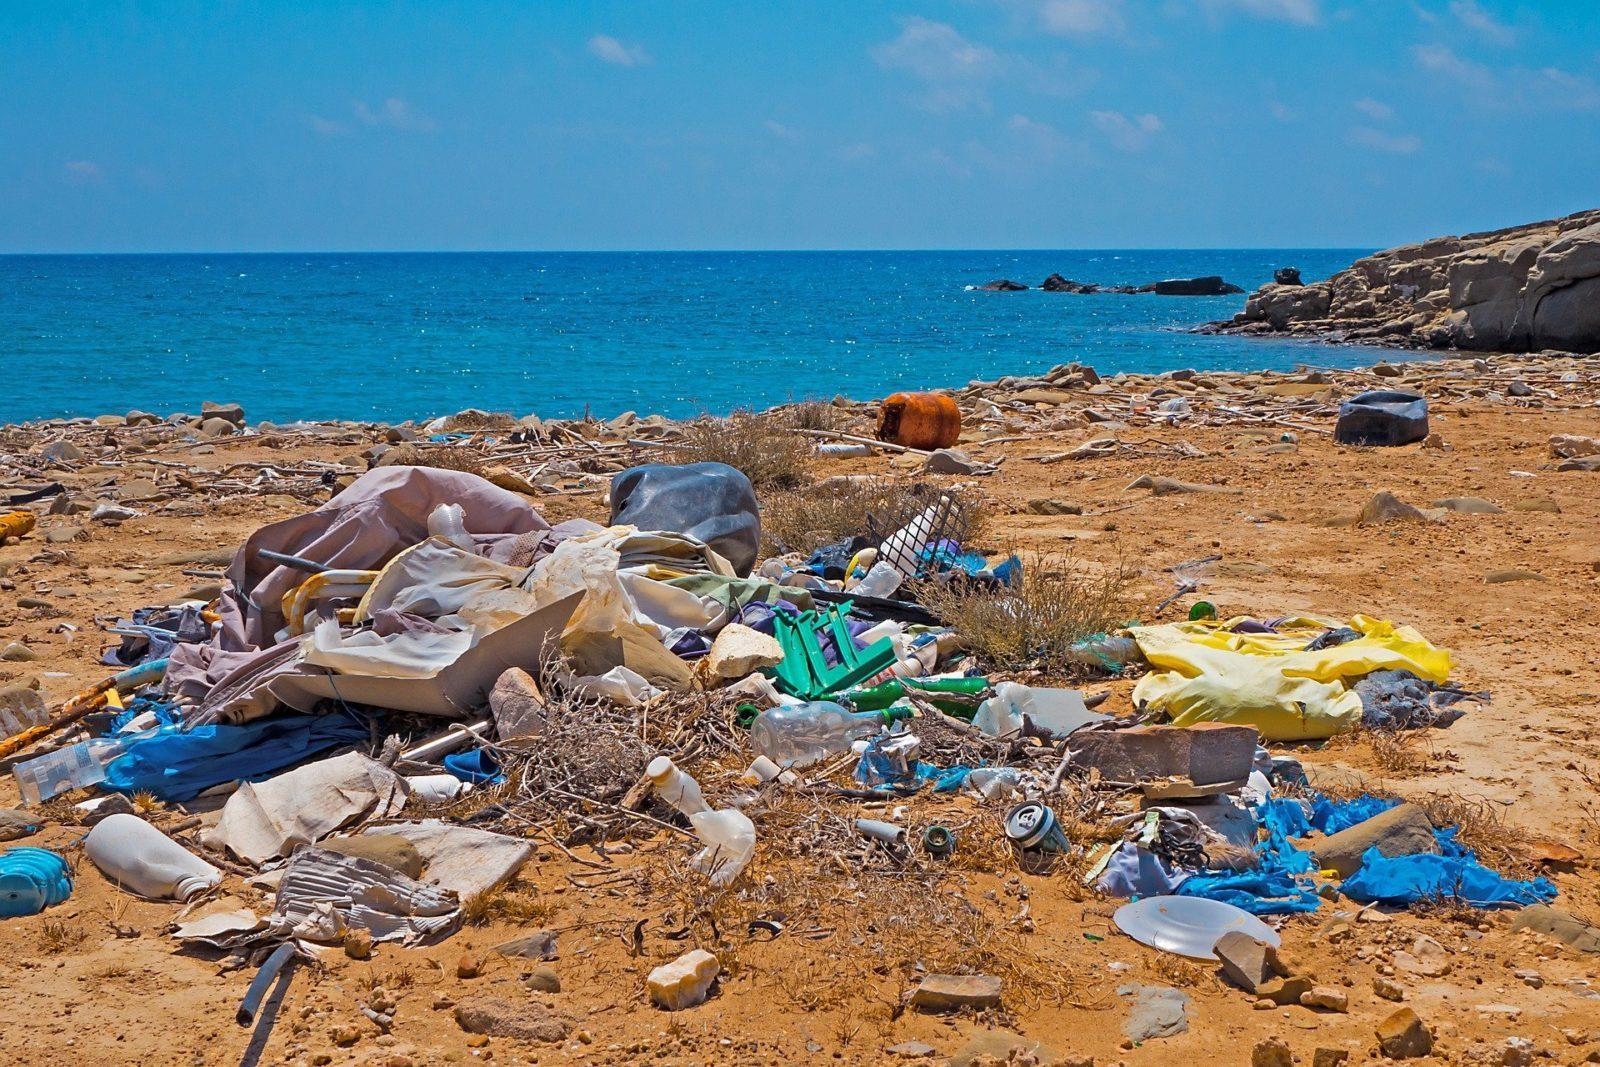 biodegradable alternative to plastic